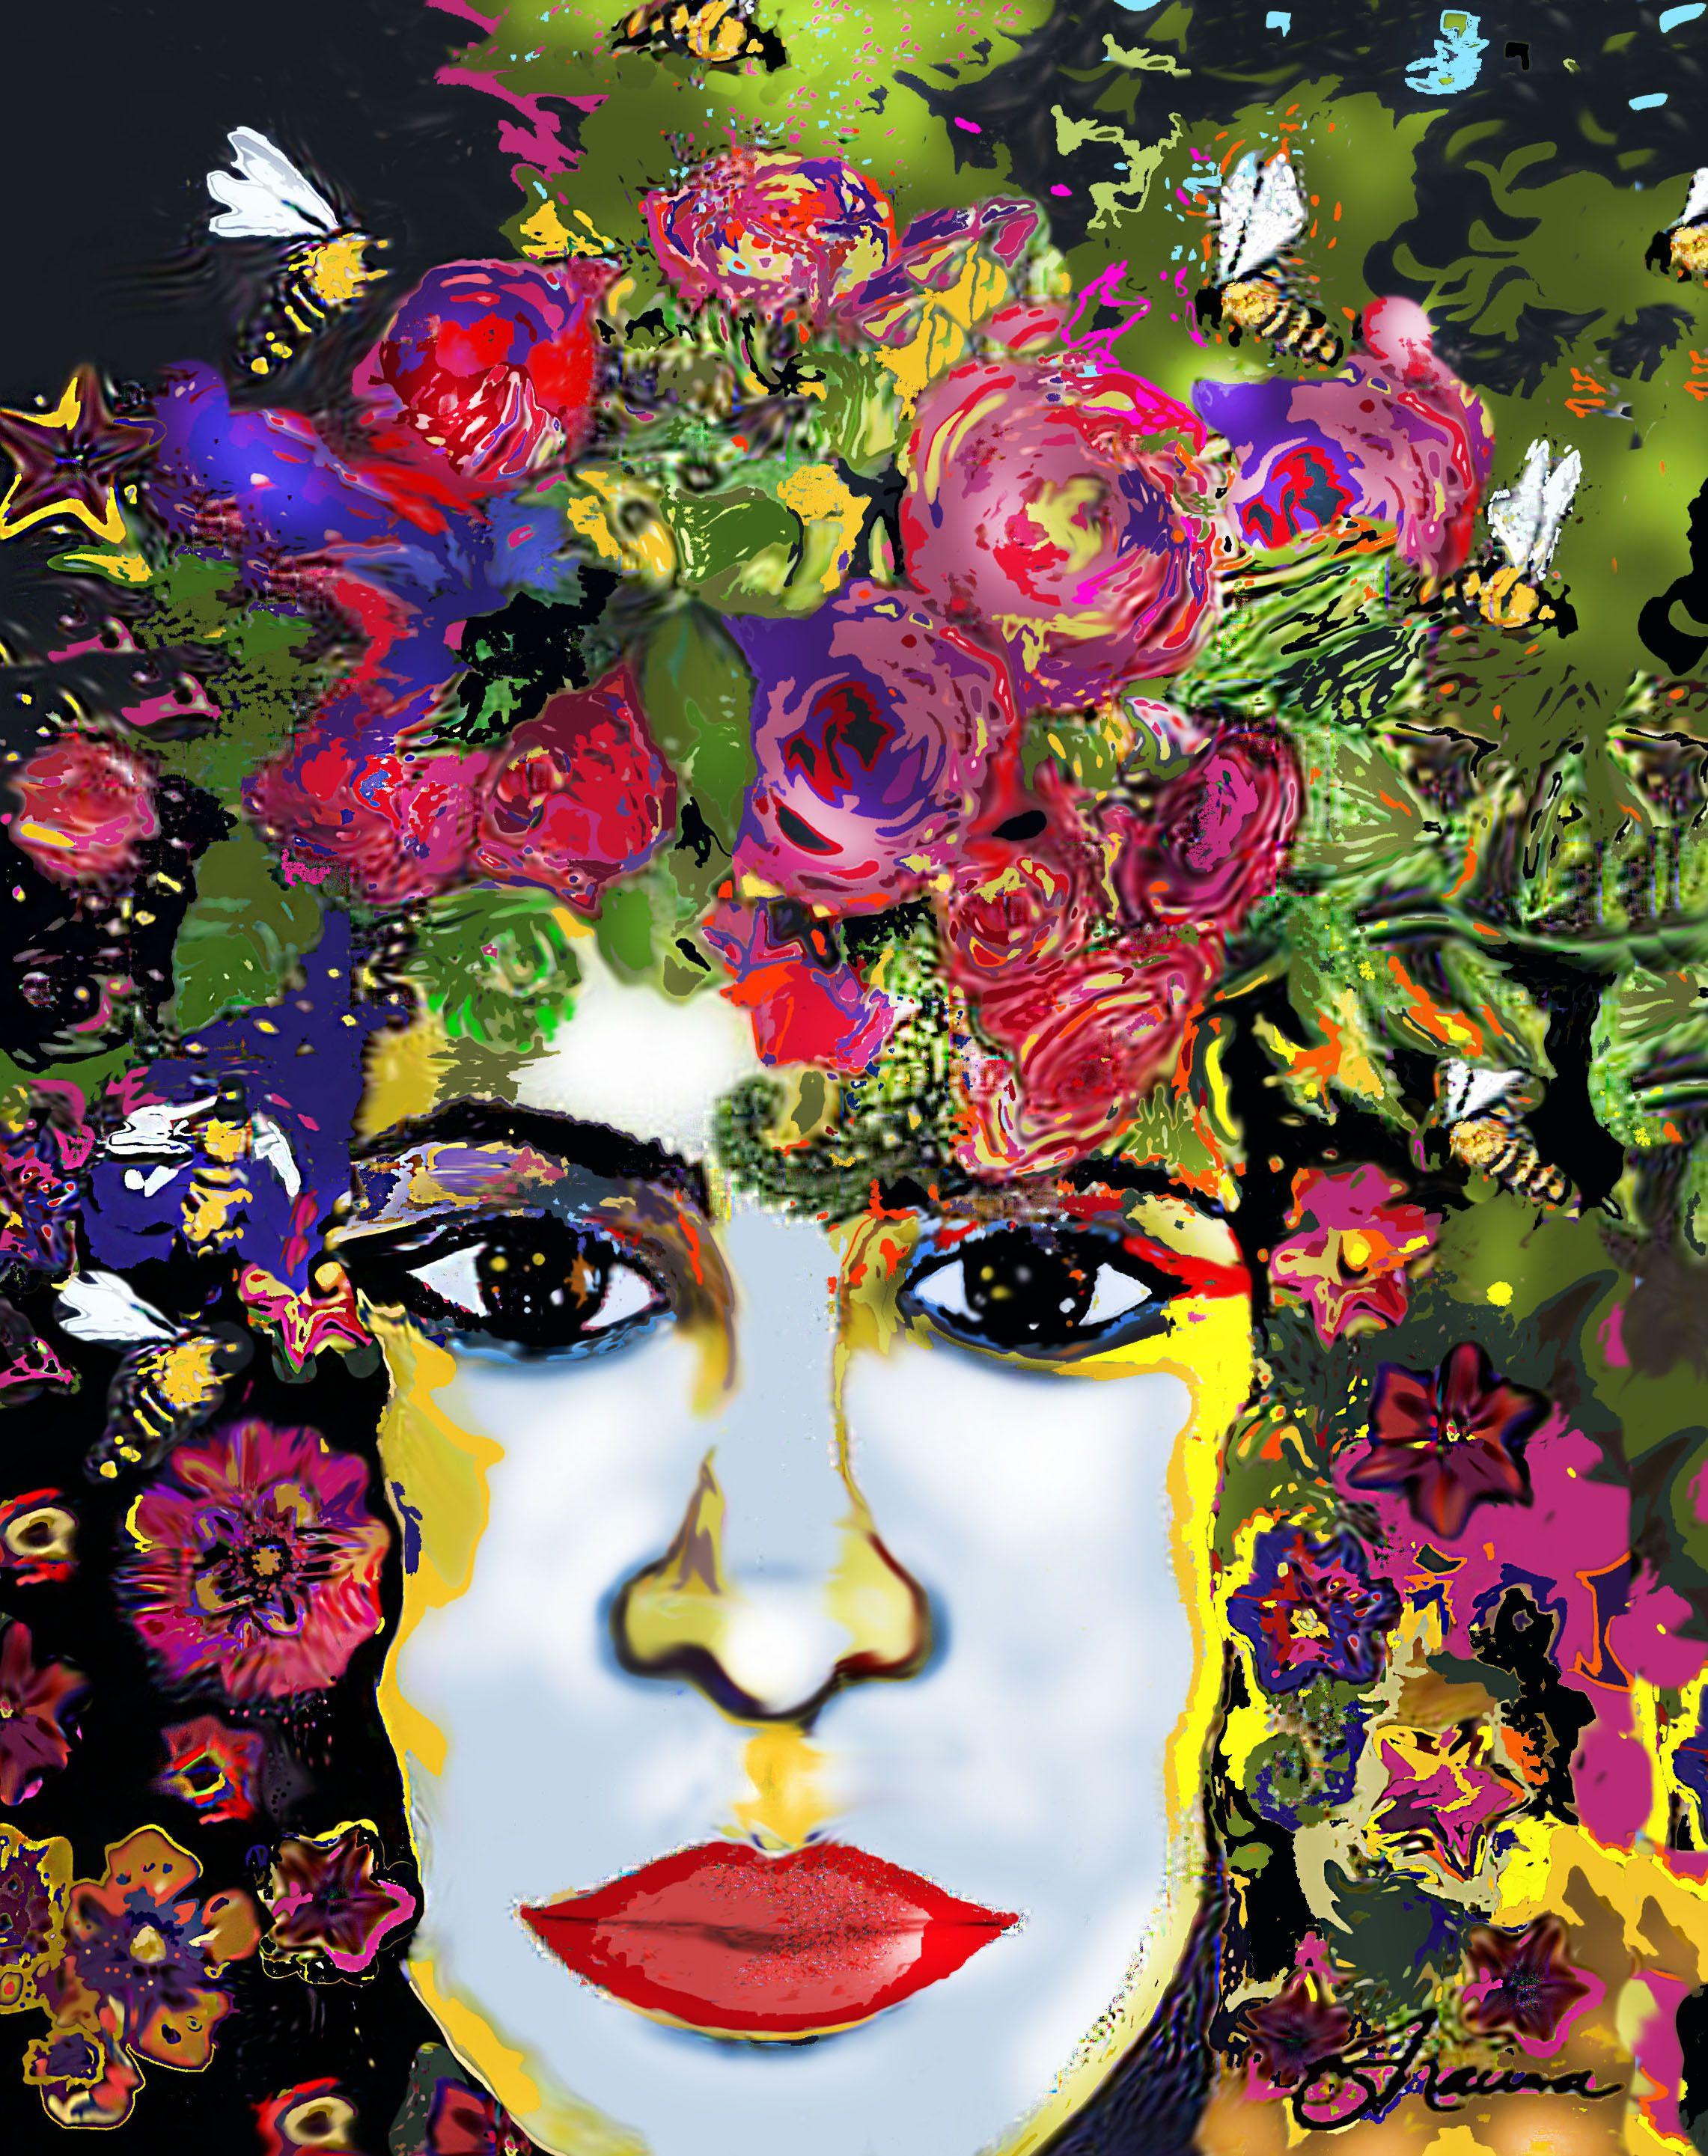 Original Digitally Enhance Mixed Media By Shauna Crandall